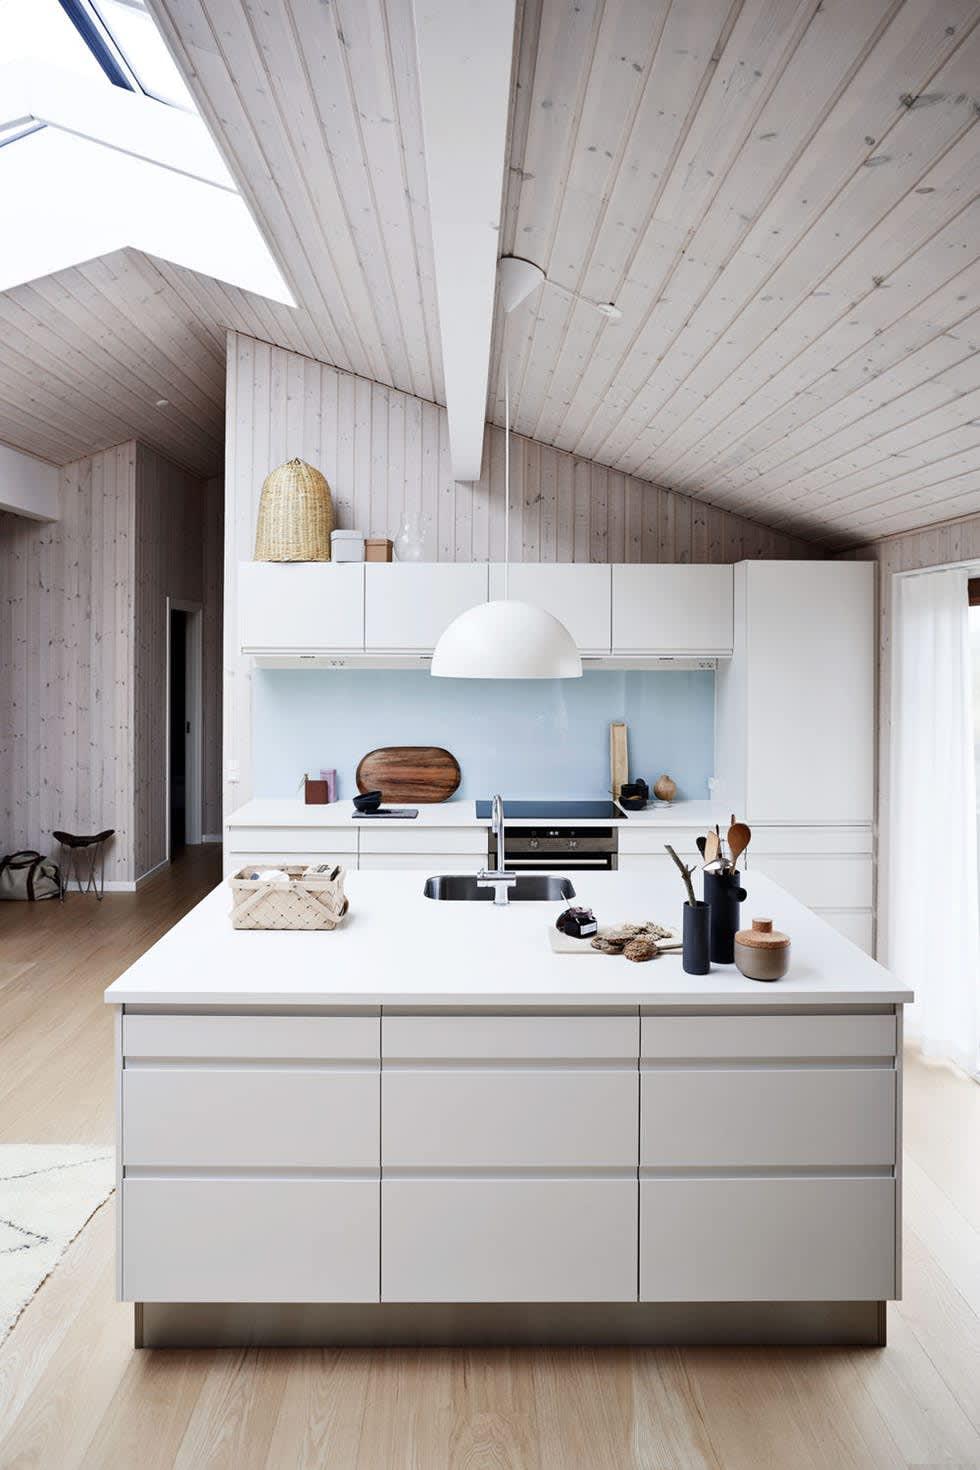 11 Beautiful Kitchen Backsplashes That Make Cleaning Easy ...